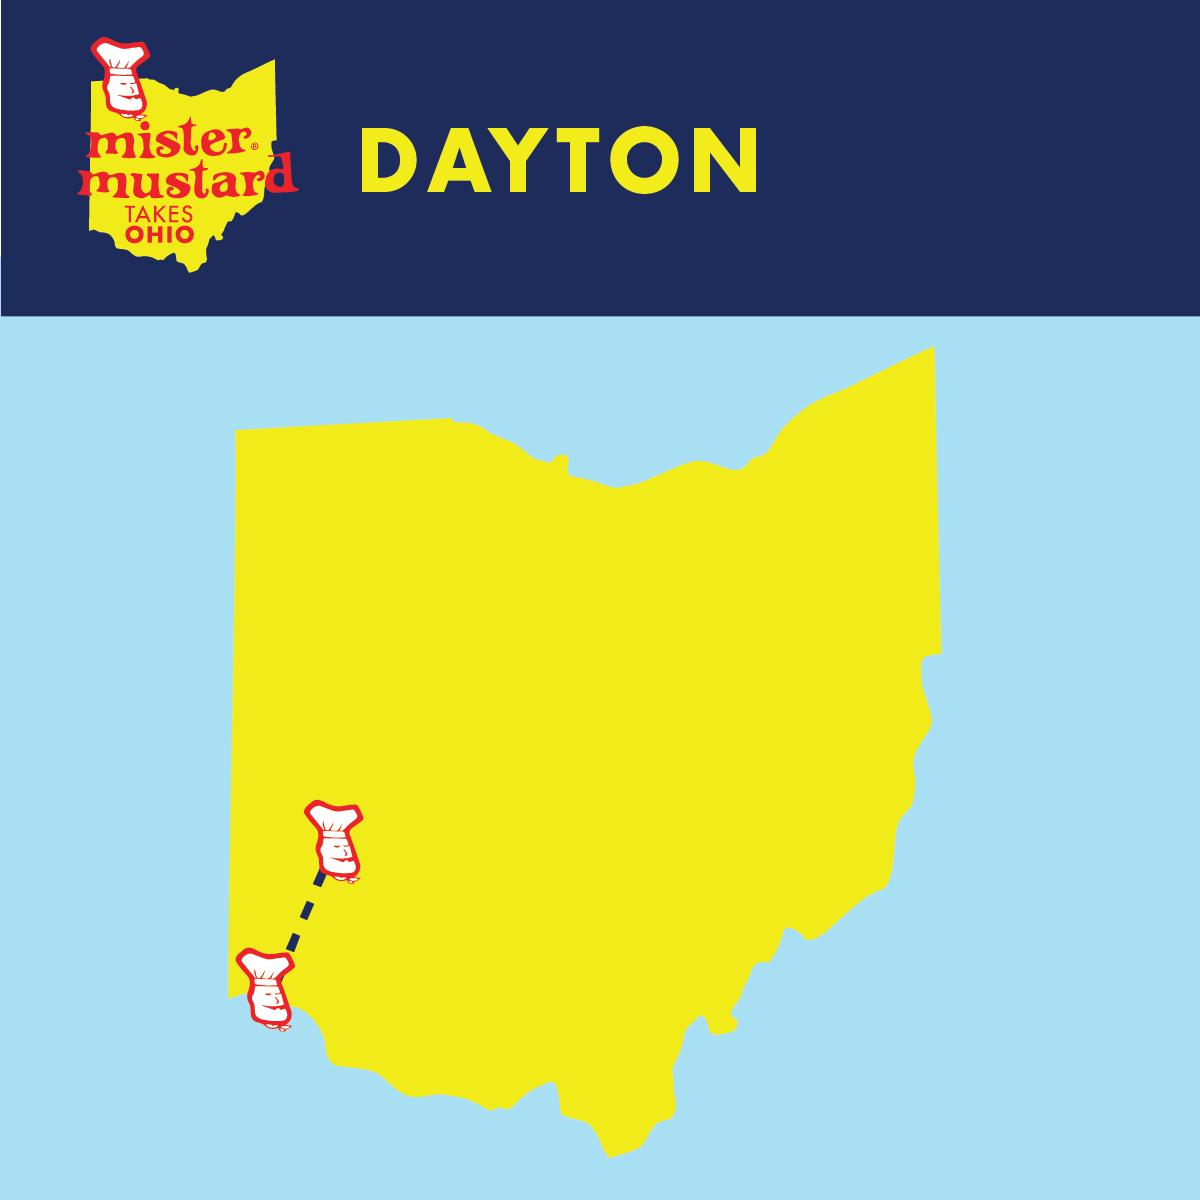 Mister Mustard Takes Ohio: Dayton